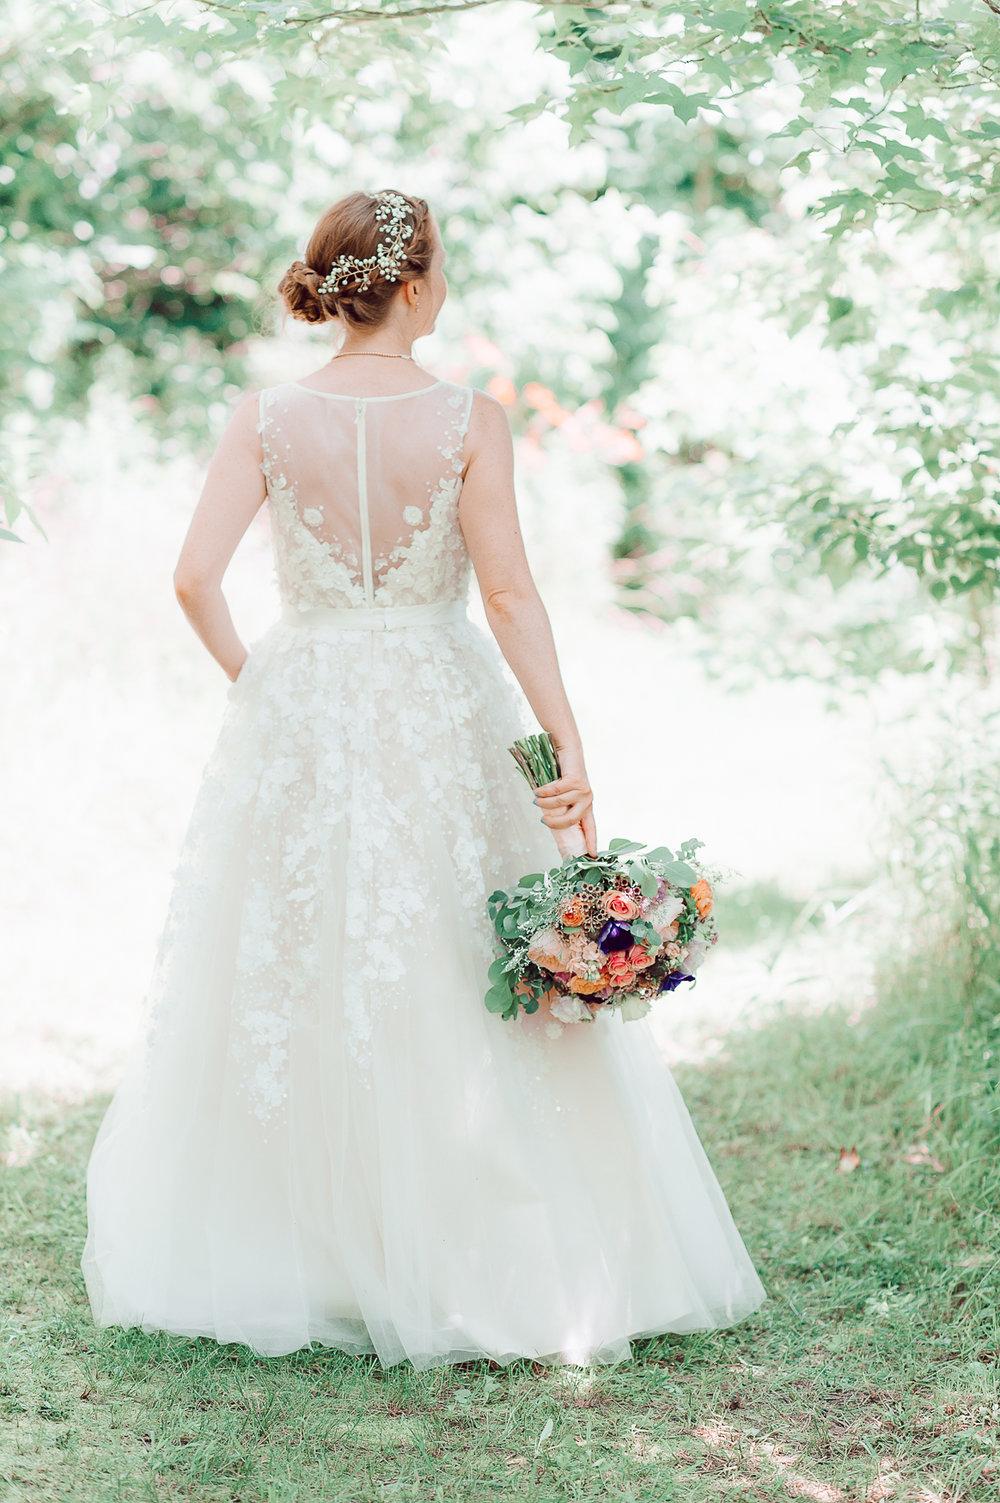 virginiawedding_theGlasgowFarm_rusticwedding_fredericksburg_youseephotography_CarolineDale (61).jpg